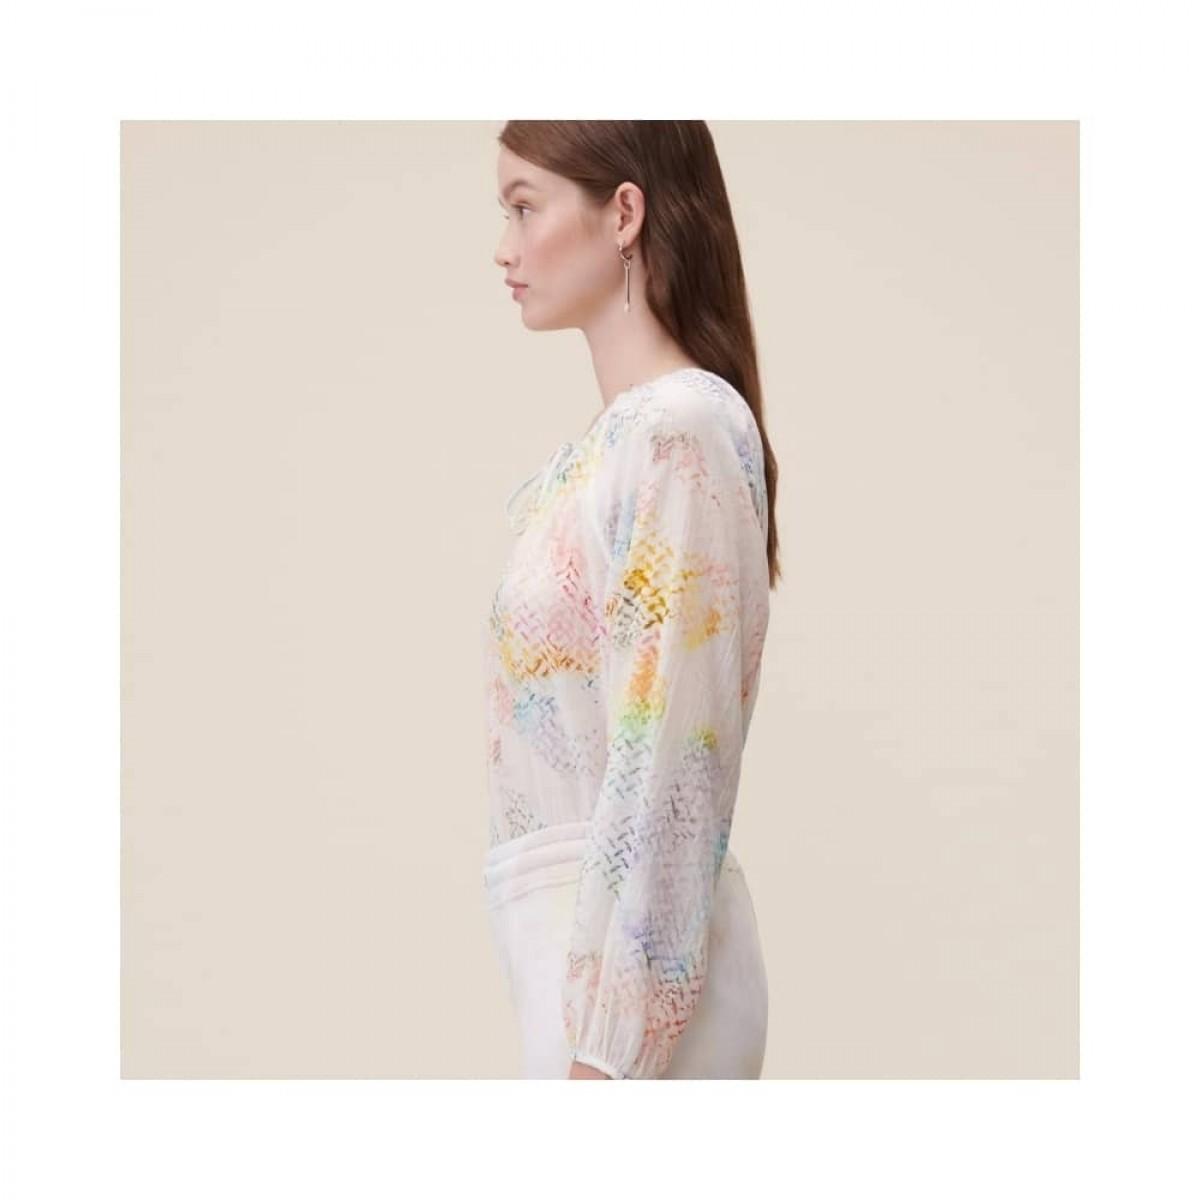 binia bluse - rainbow kufiya - model fra siden